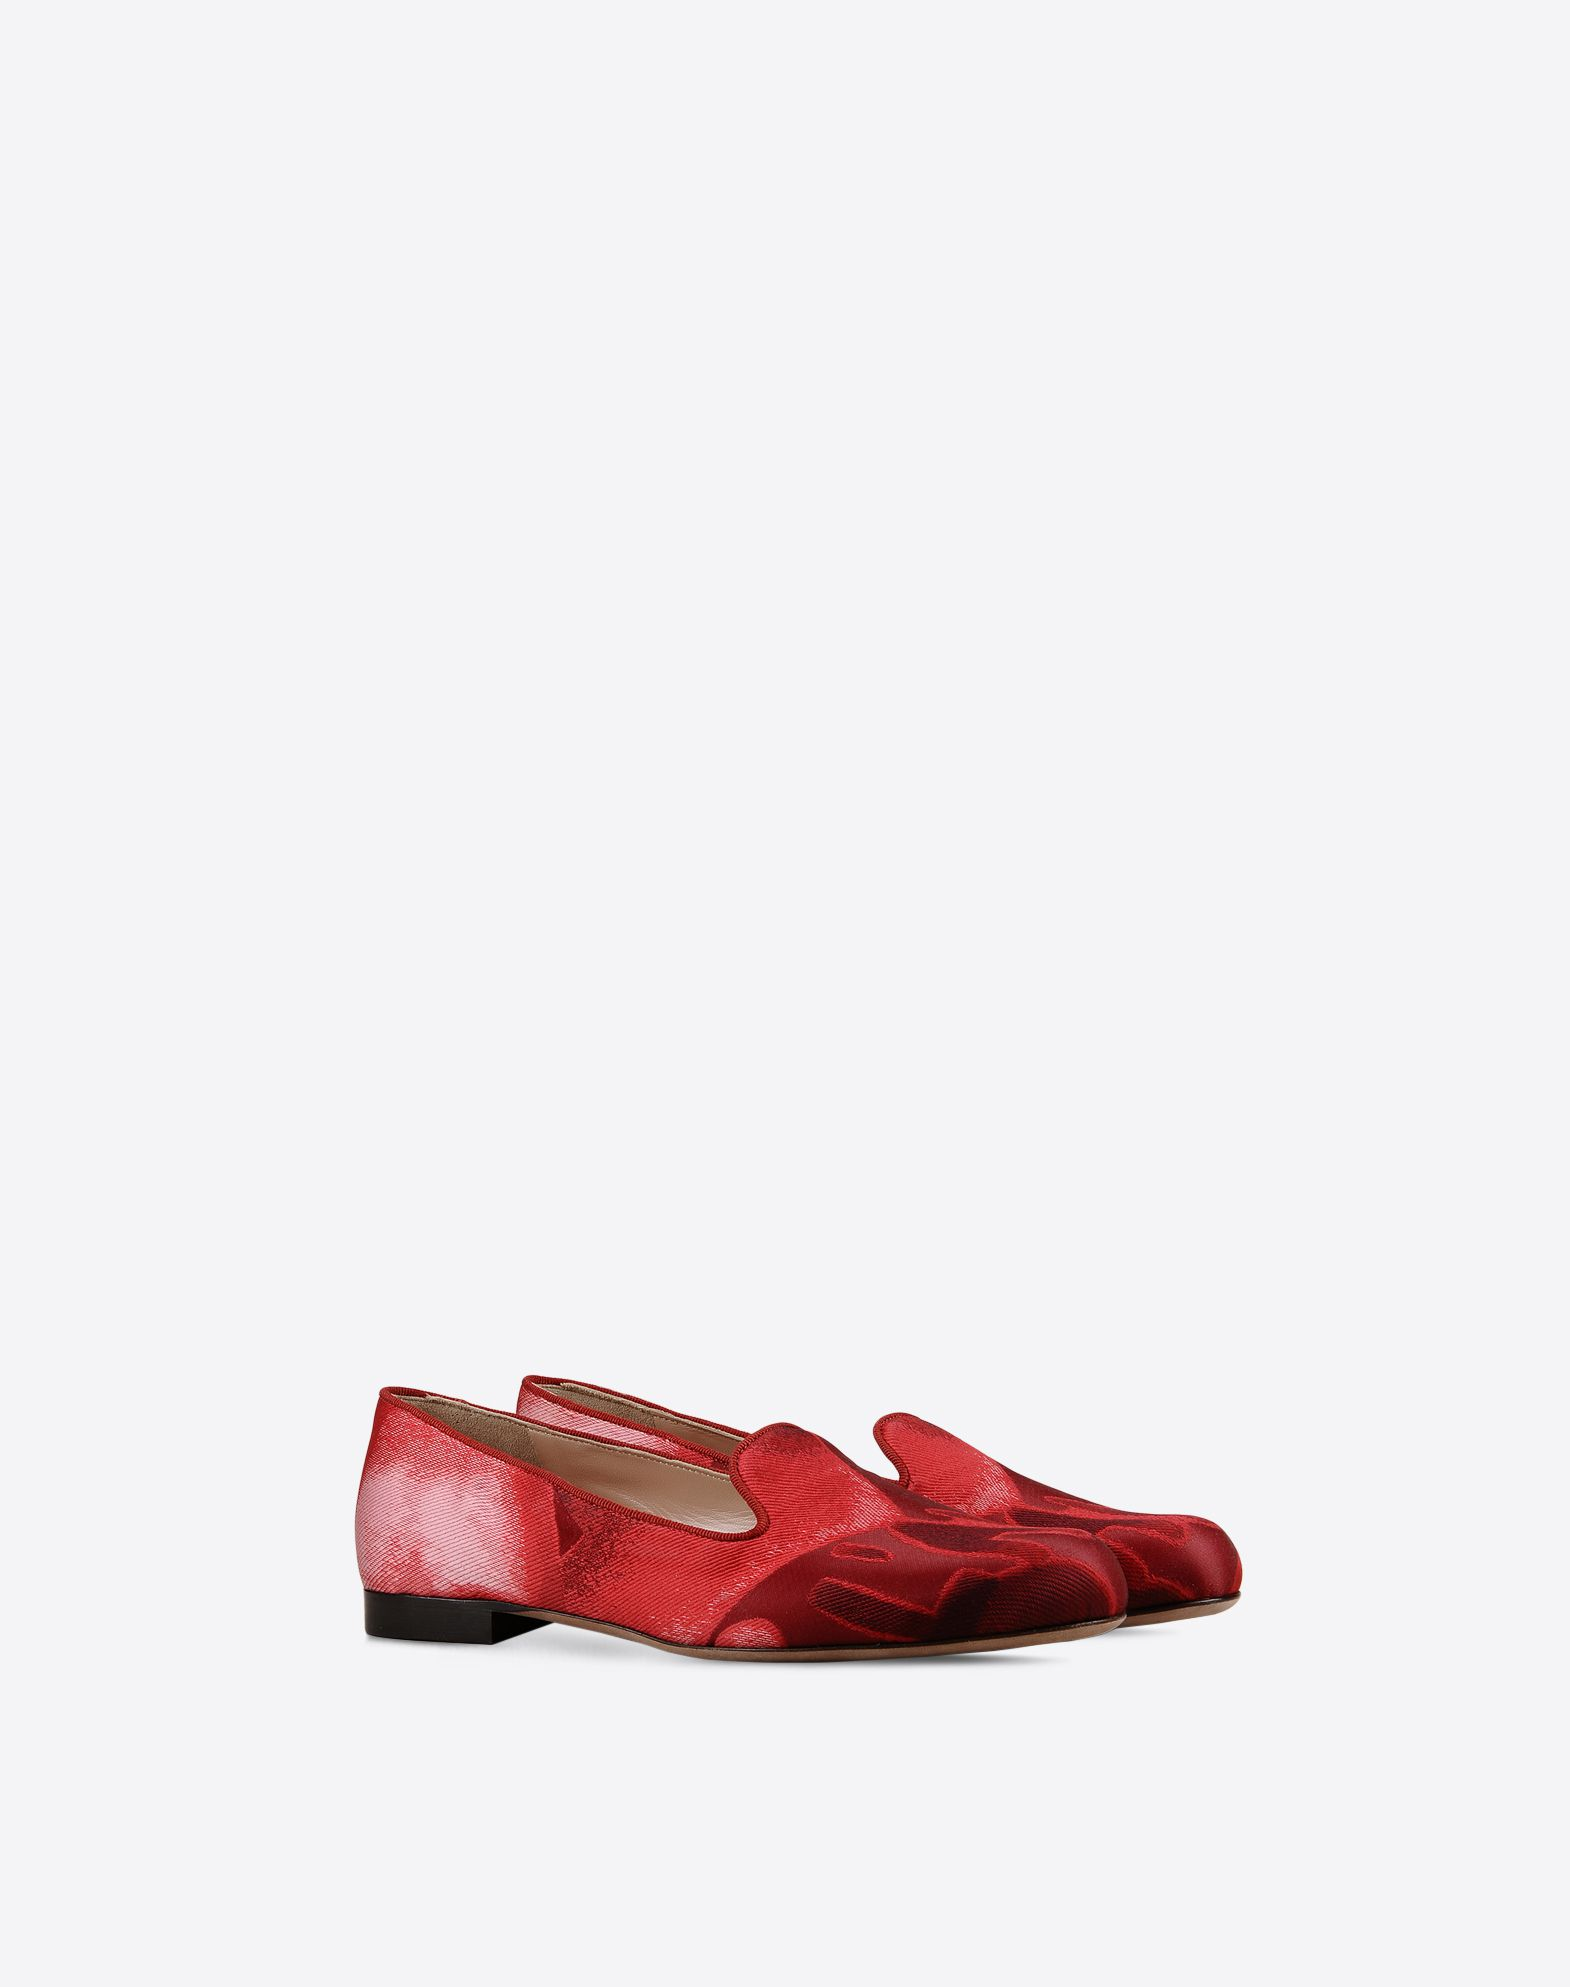 VALENTINO Plain weave Jacquard Leather sole Round toeline Flat heel  44818809lk